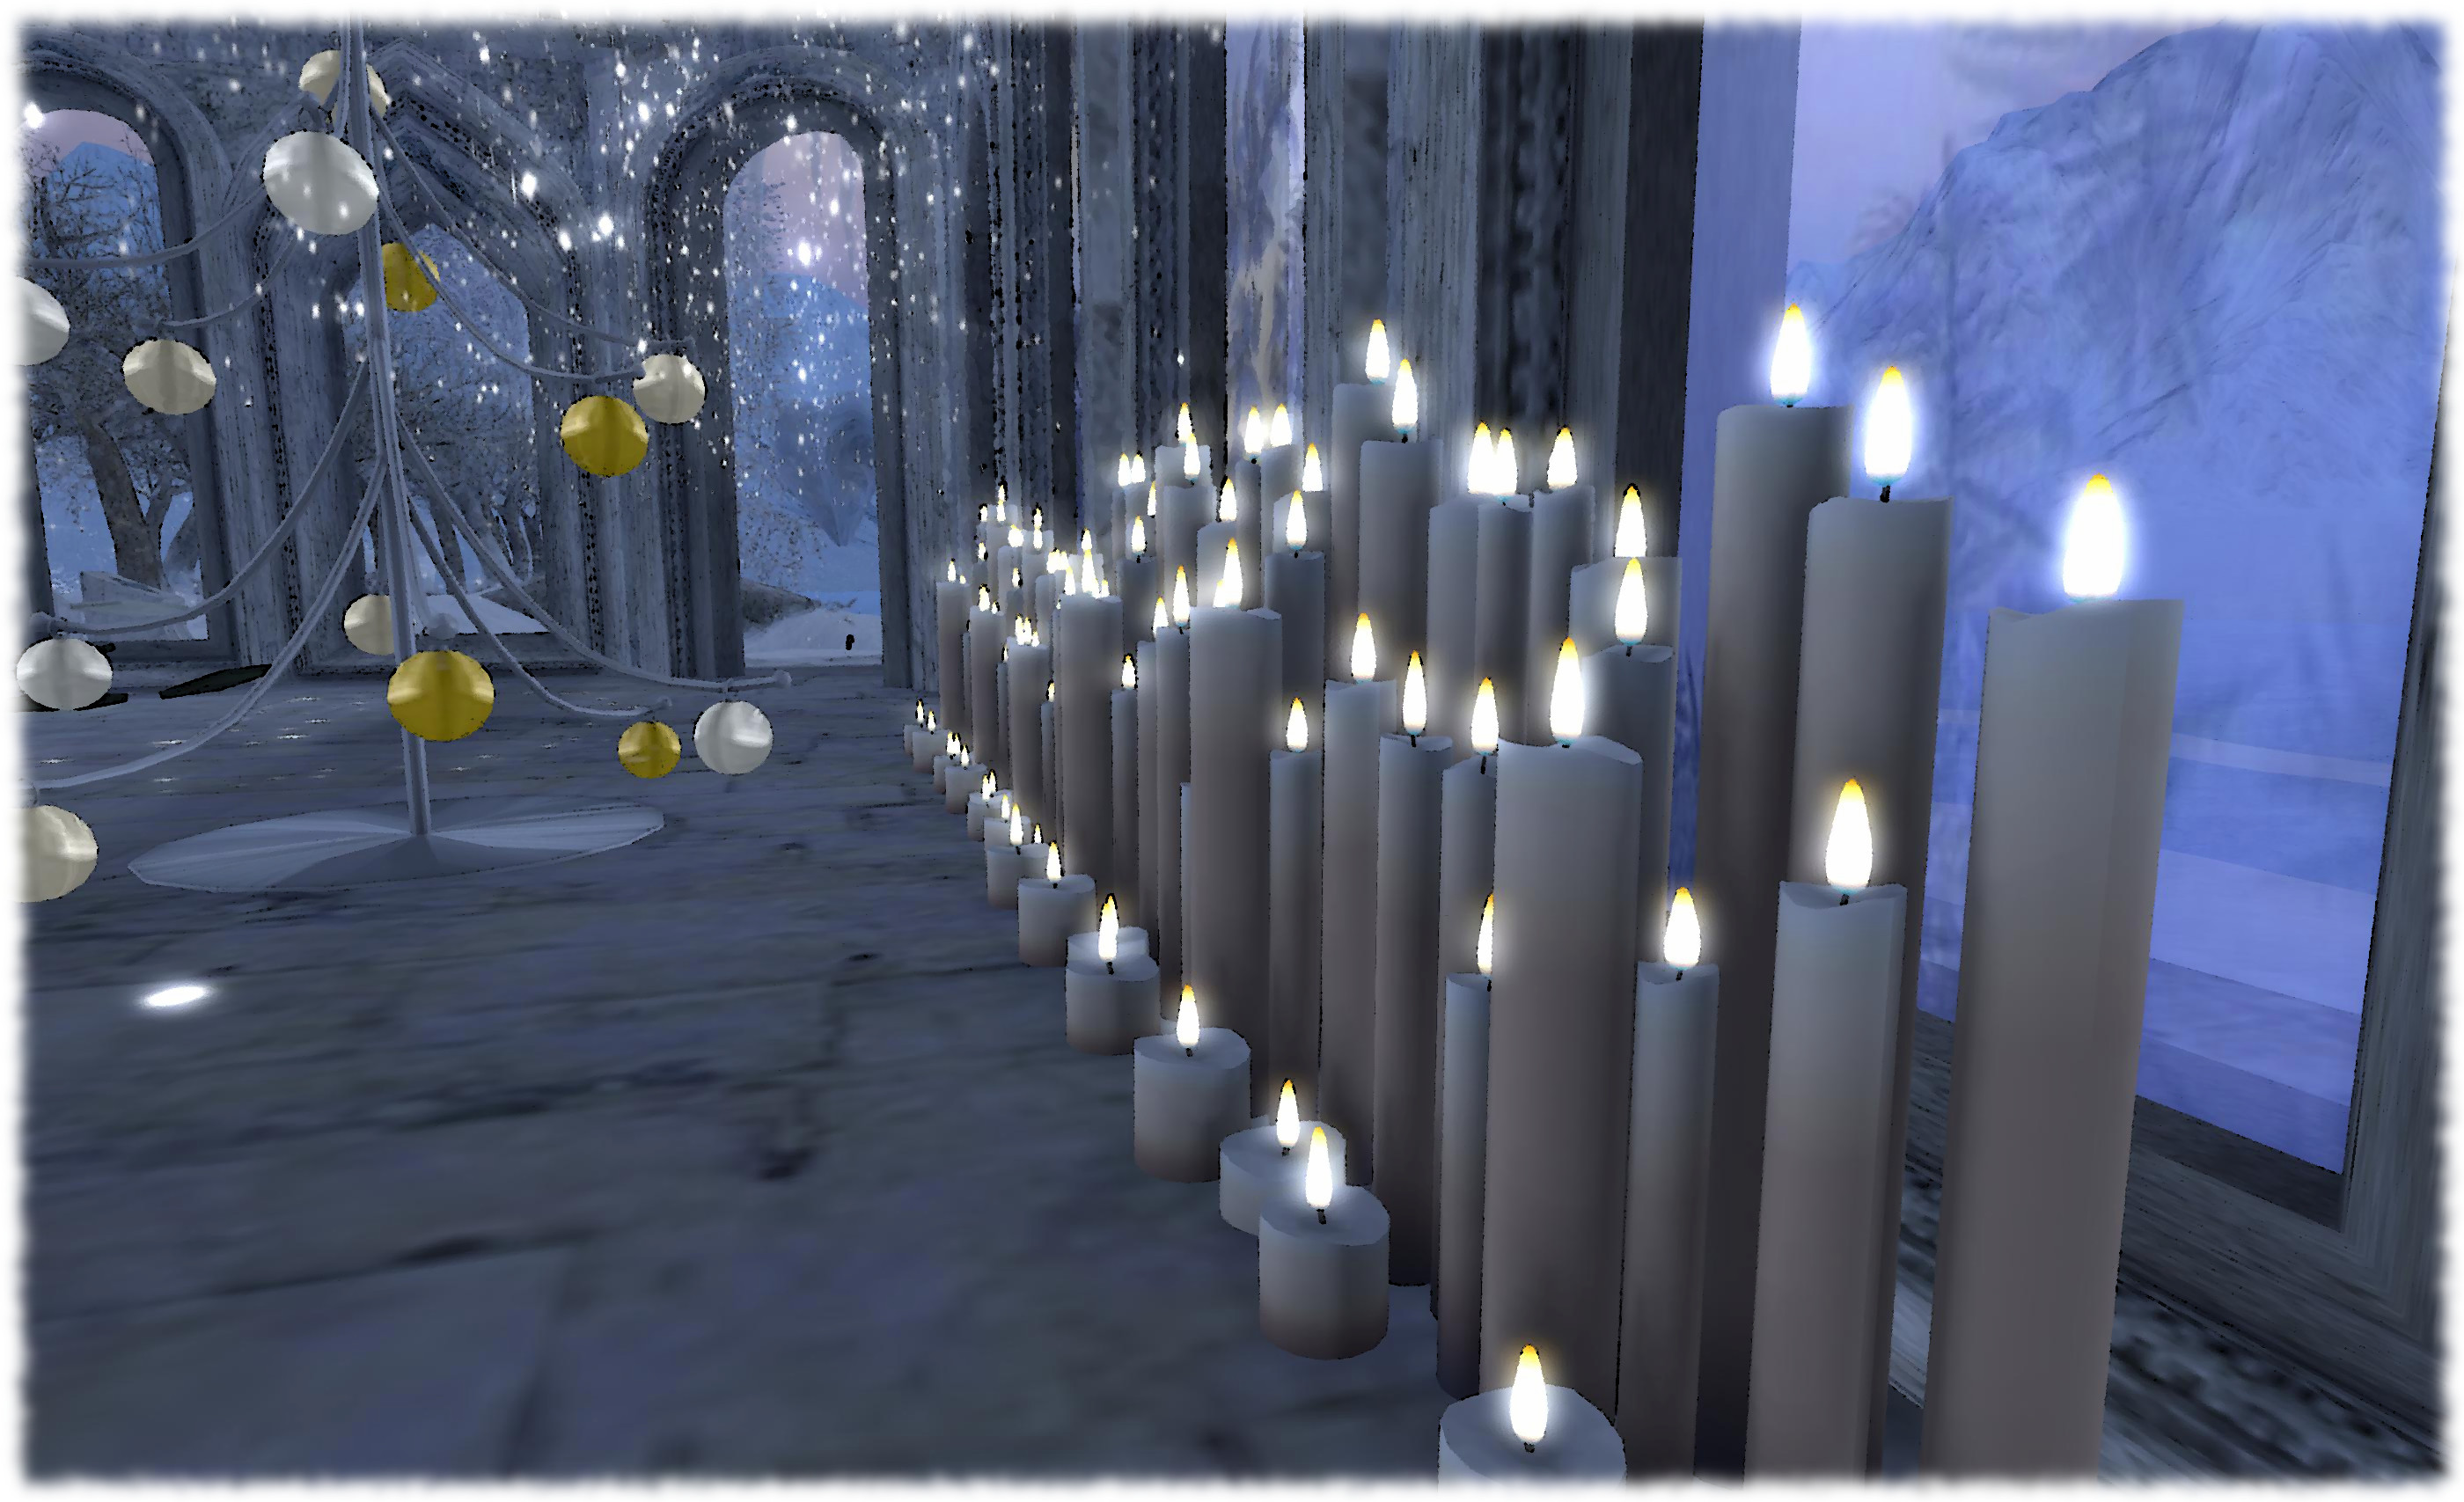 Mystic Winter Dream, January 2014